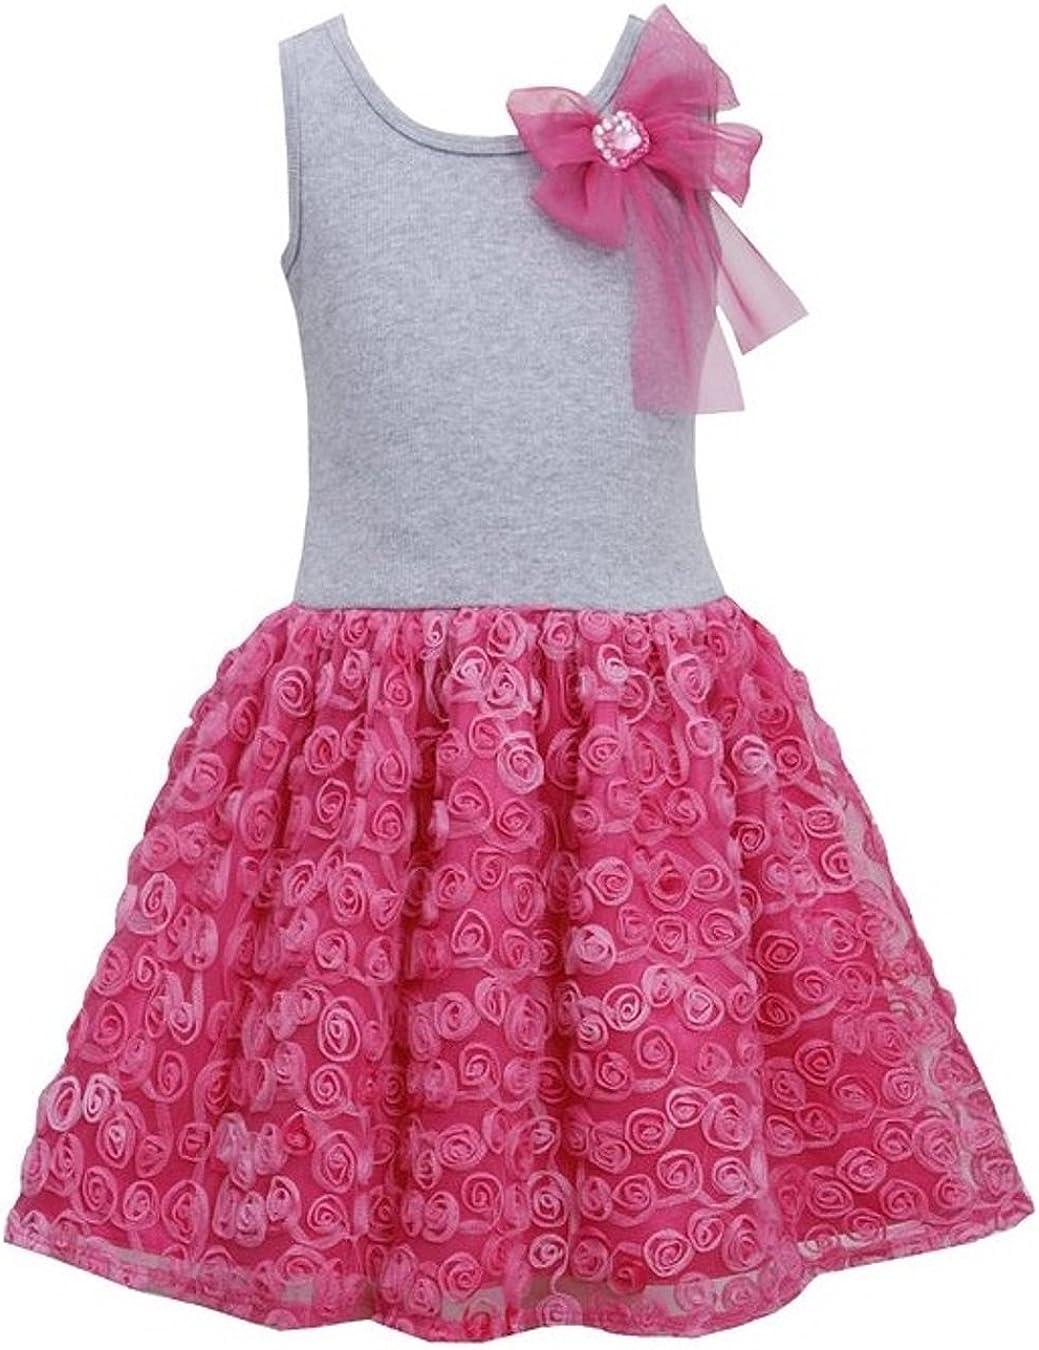 Little Girls Bow Shoulder Knit to Bonaz Rosette Mesh size 4